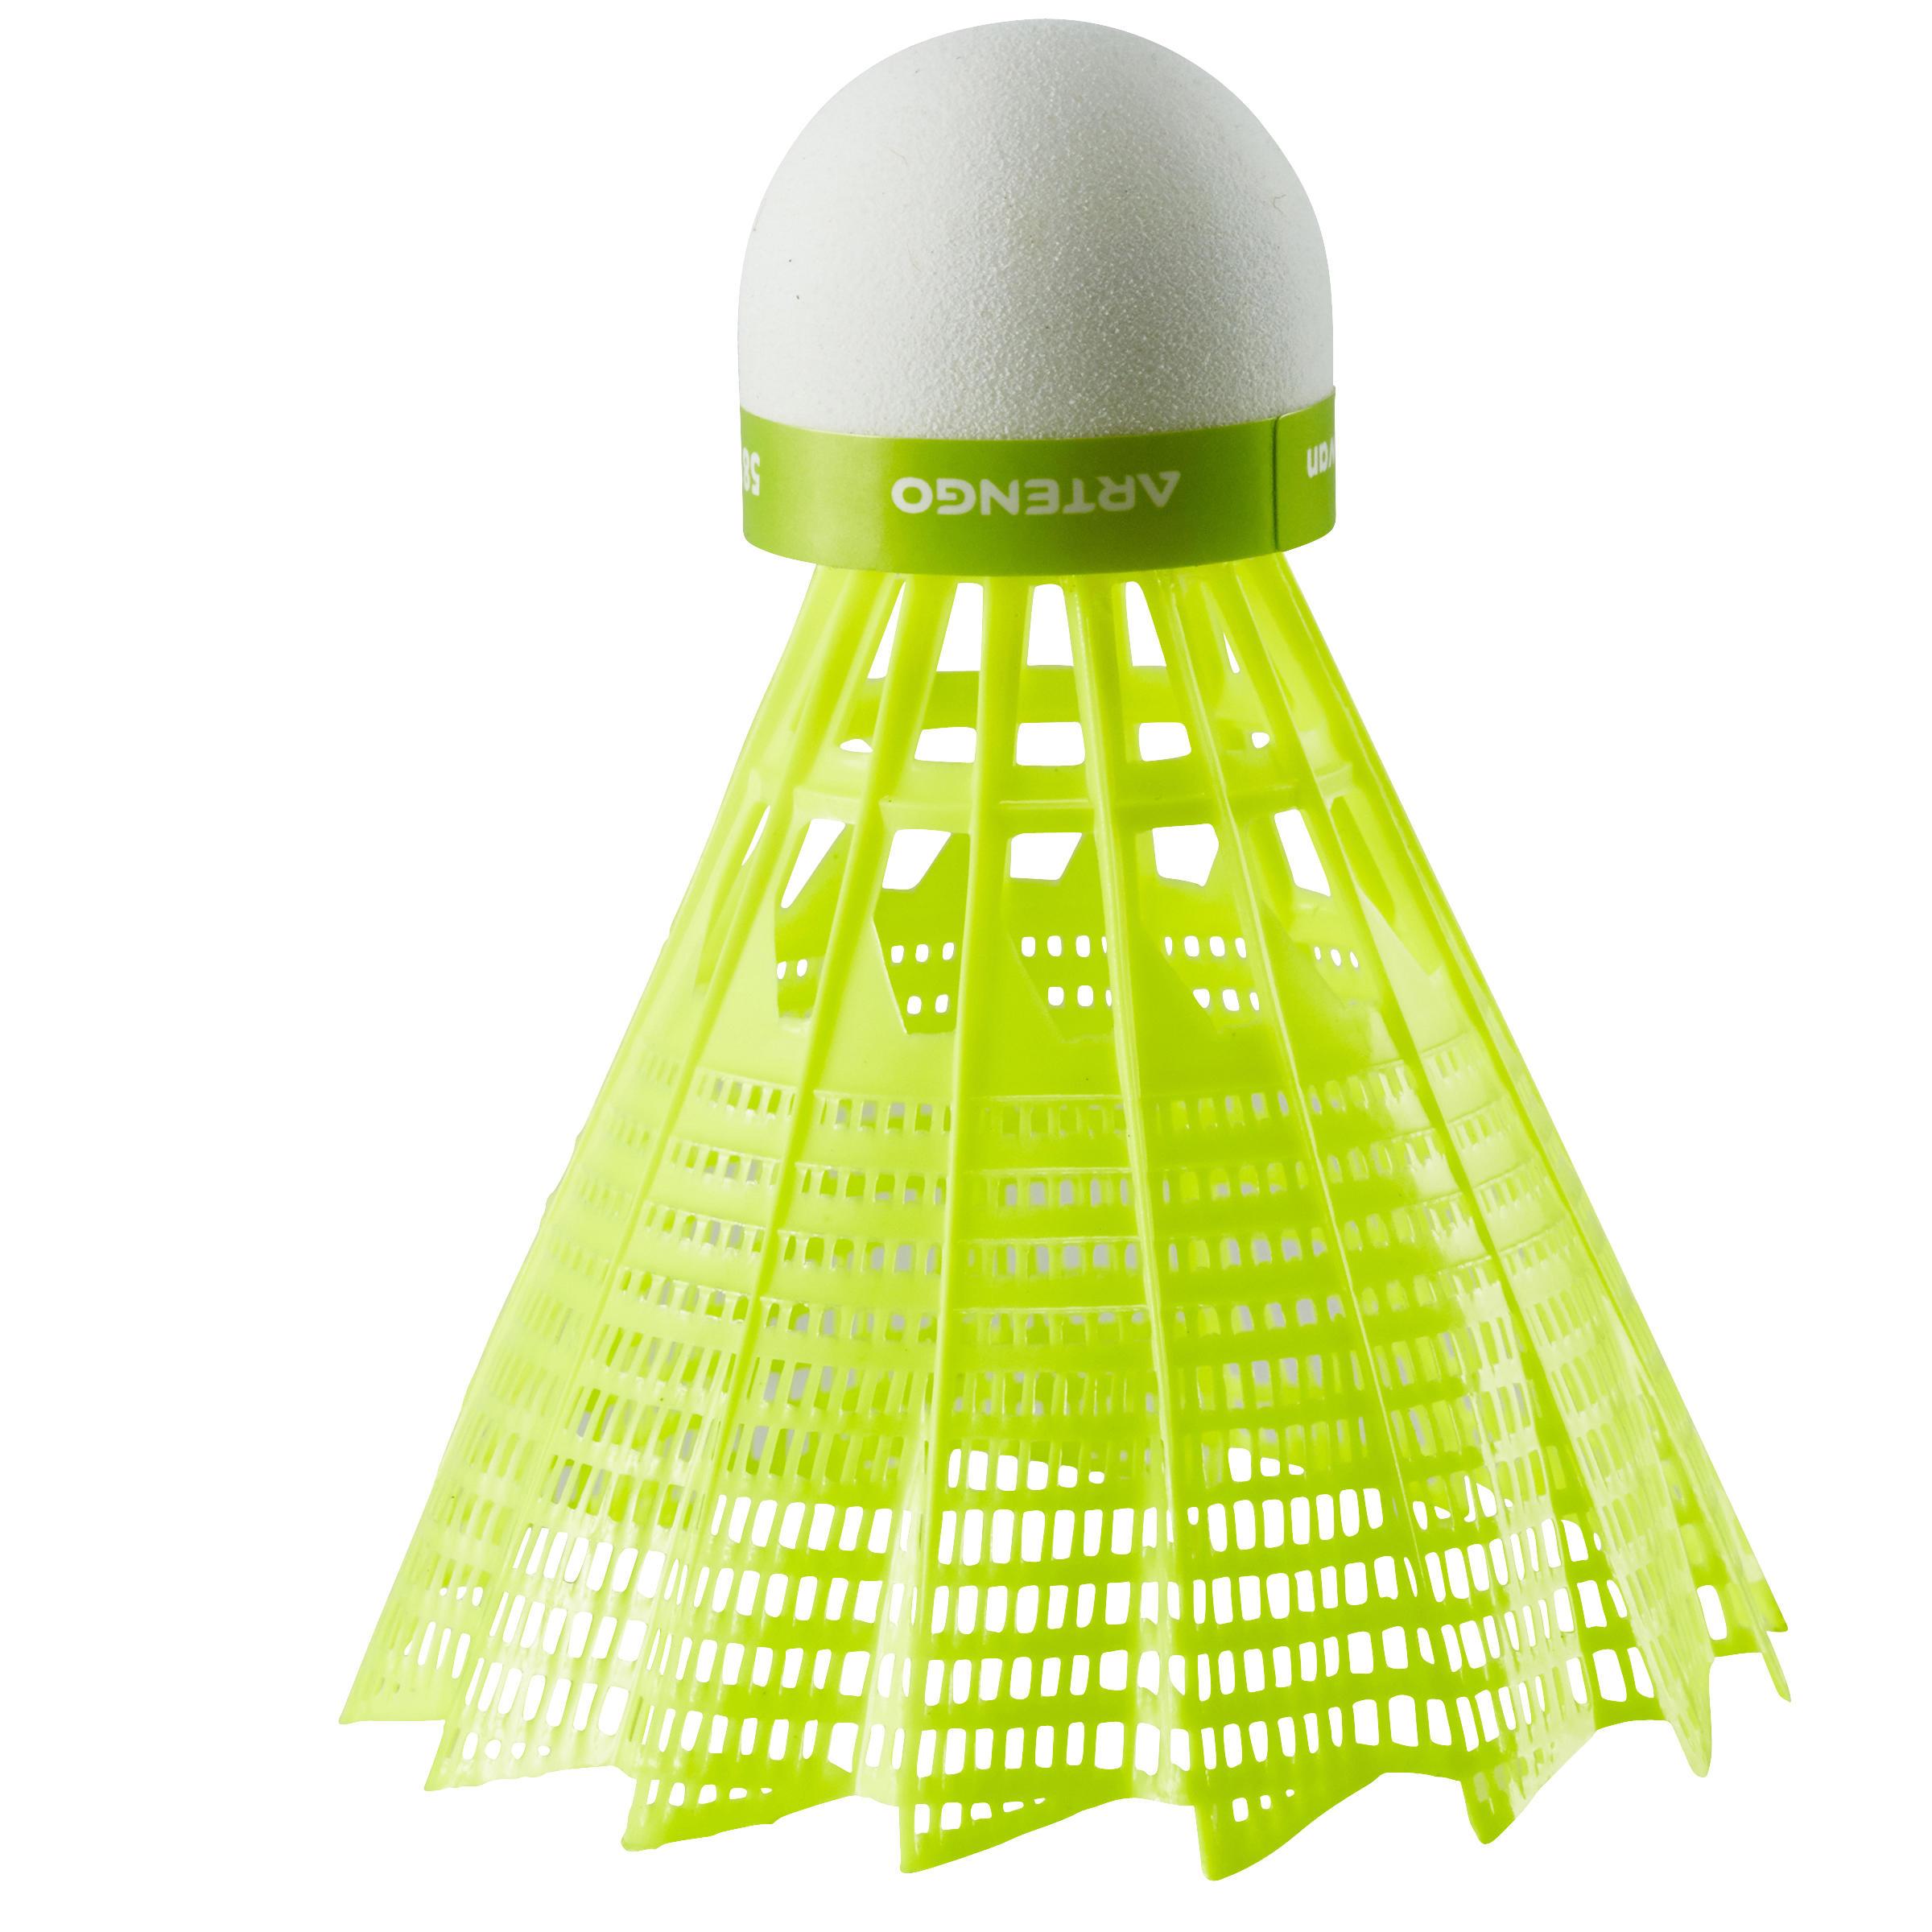 BSC700 Badminton Shuttle Single-Pack - Kuning